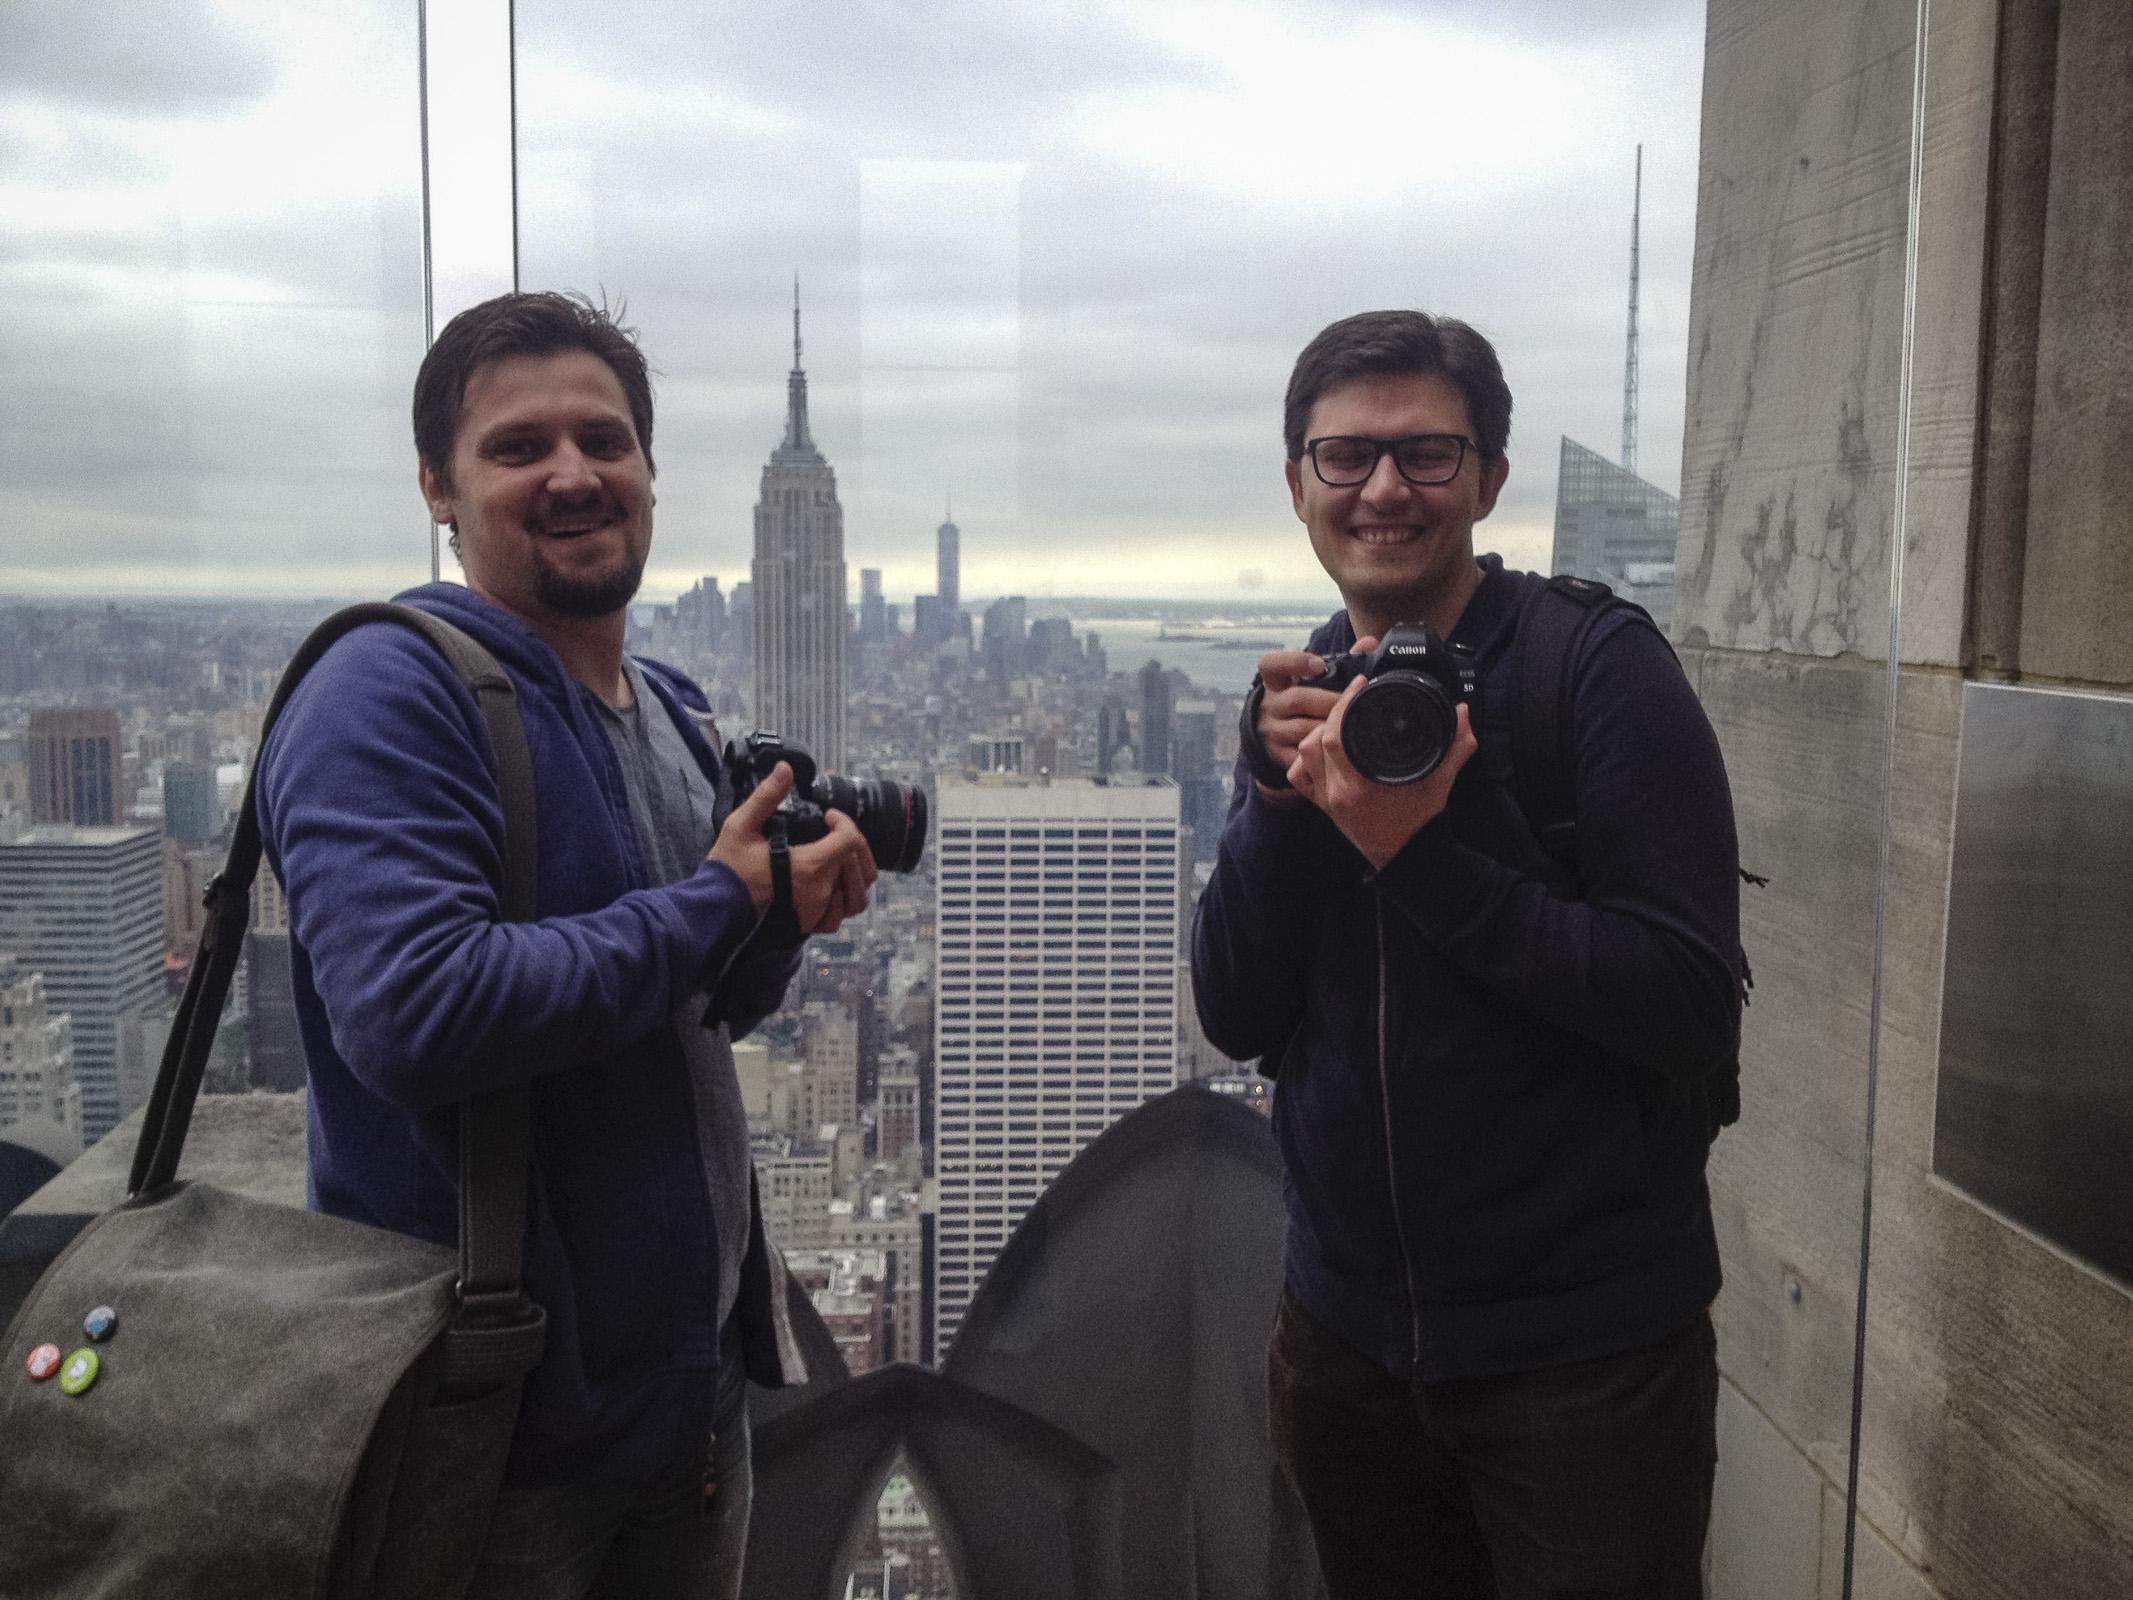 NYC2014-iphone-005.jpg